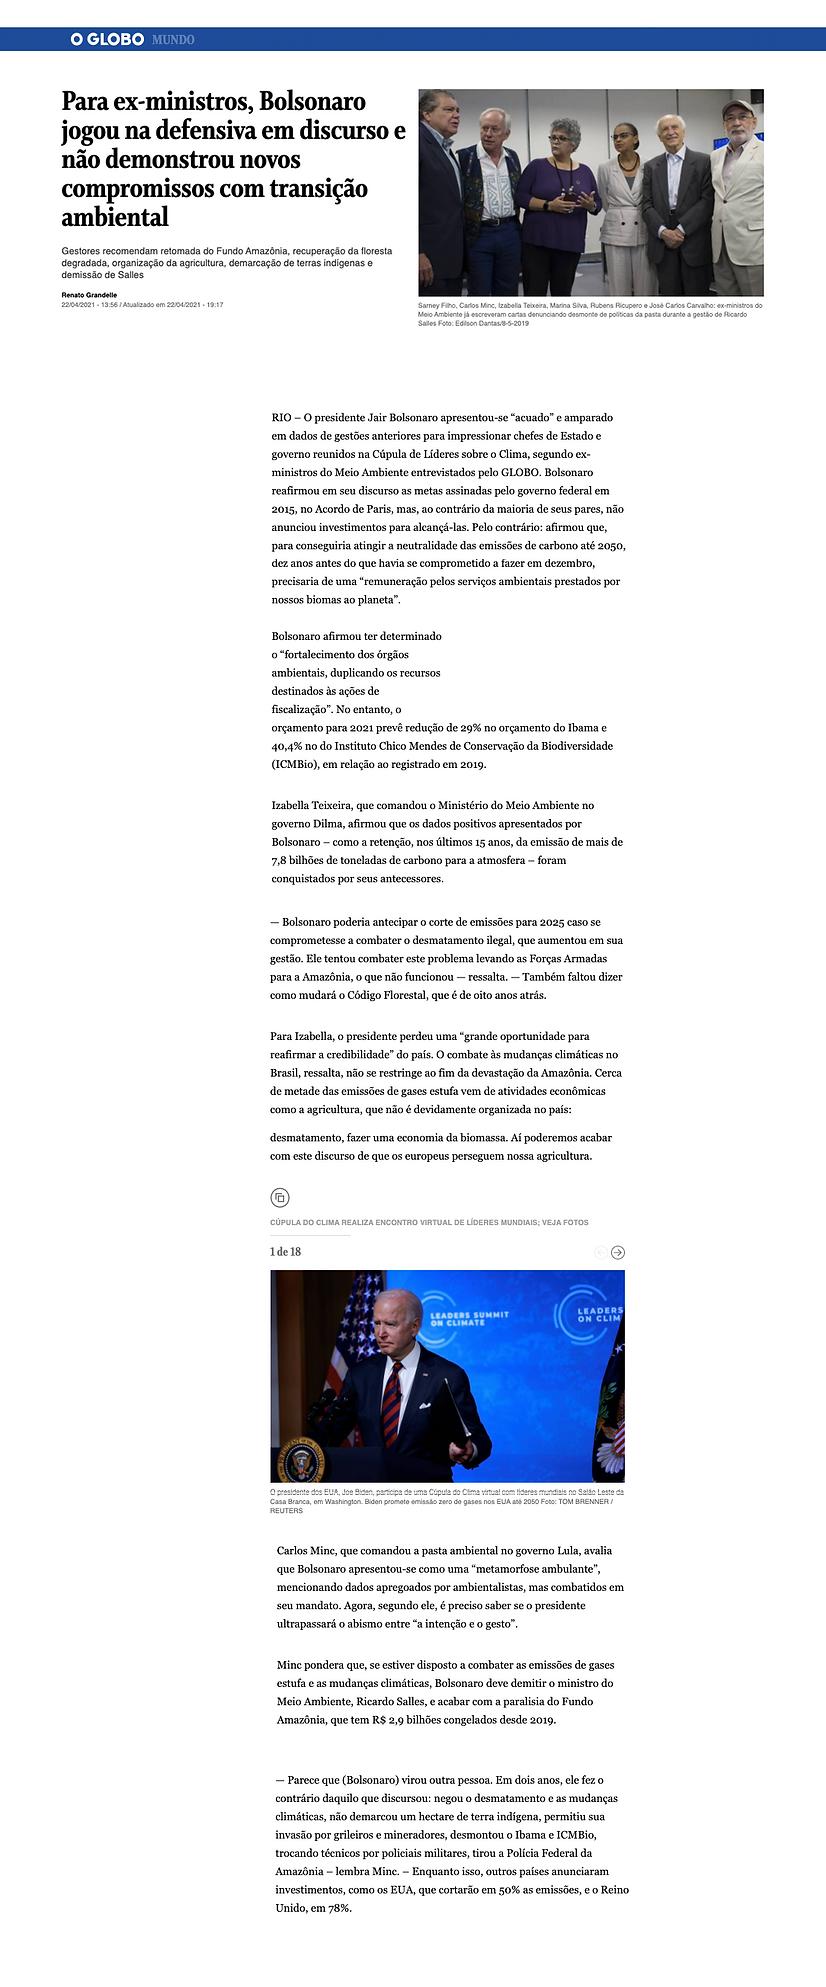 screenshot-oglobo.globo.com-2021.04.26-1